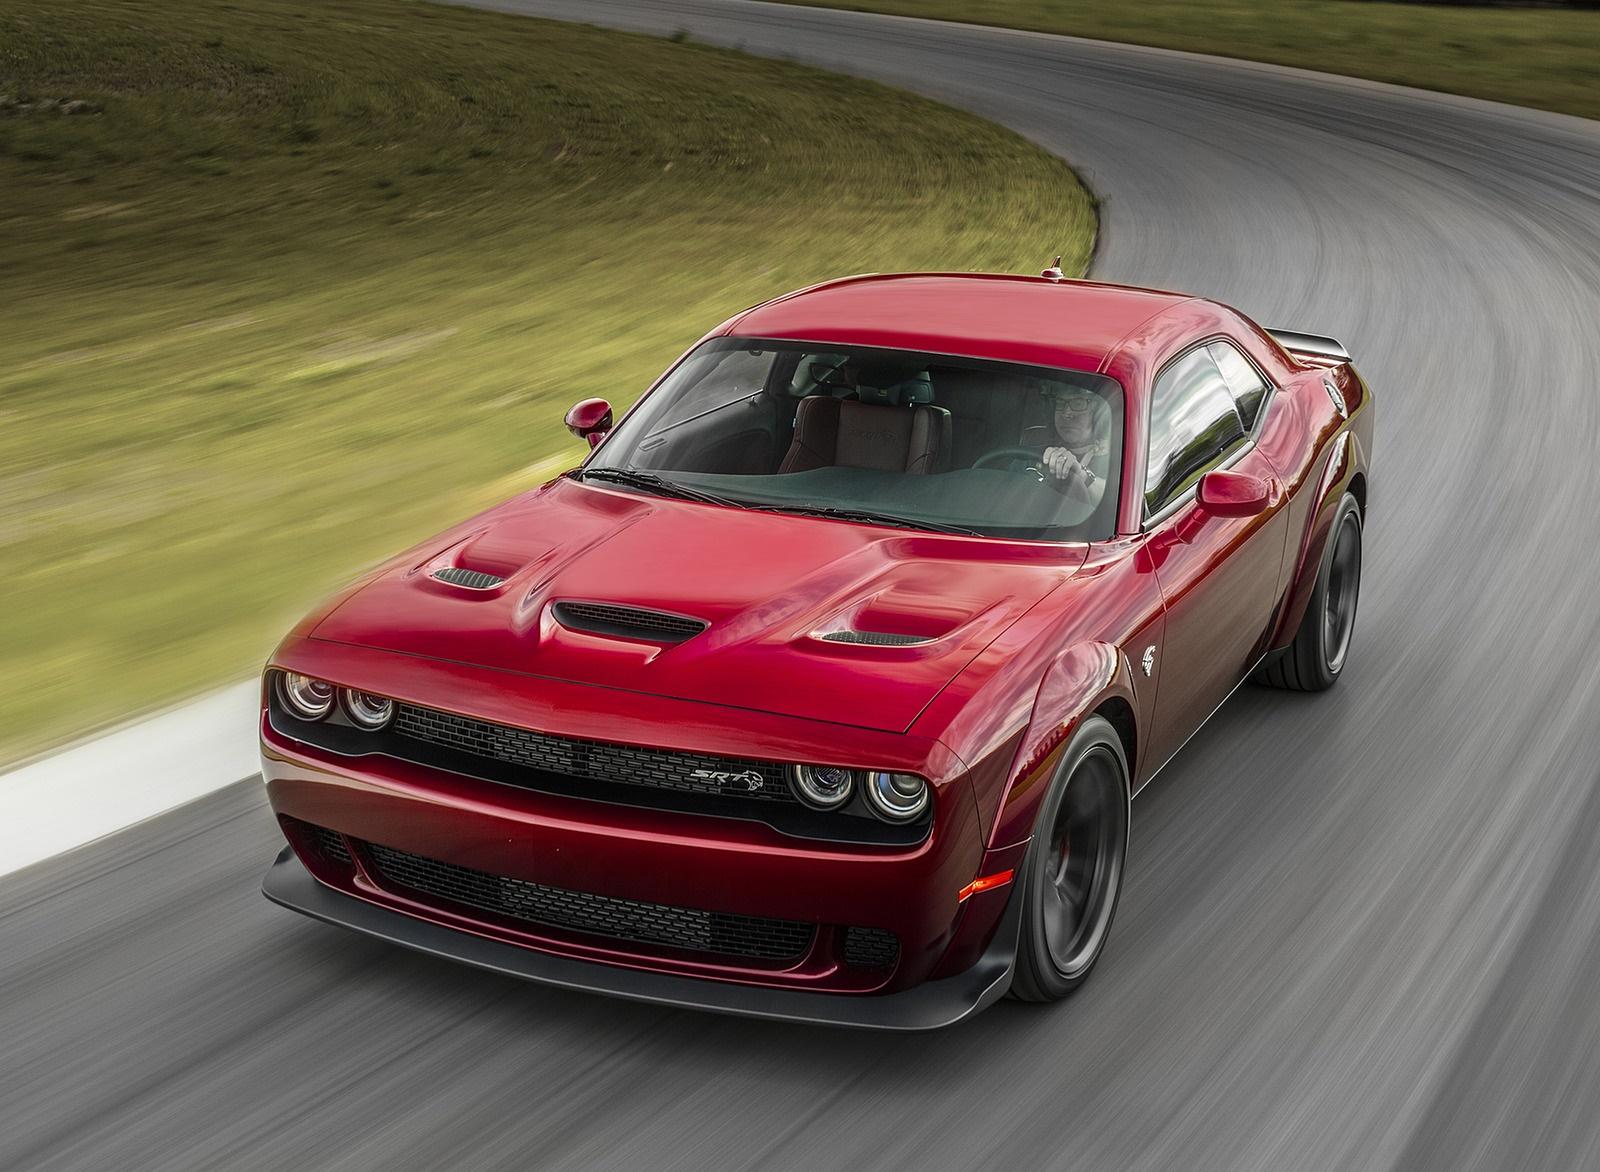 2018 Dodge Challenger SRT Hellcat Widebody Front Three-Quarter Wallpaper (1)